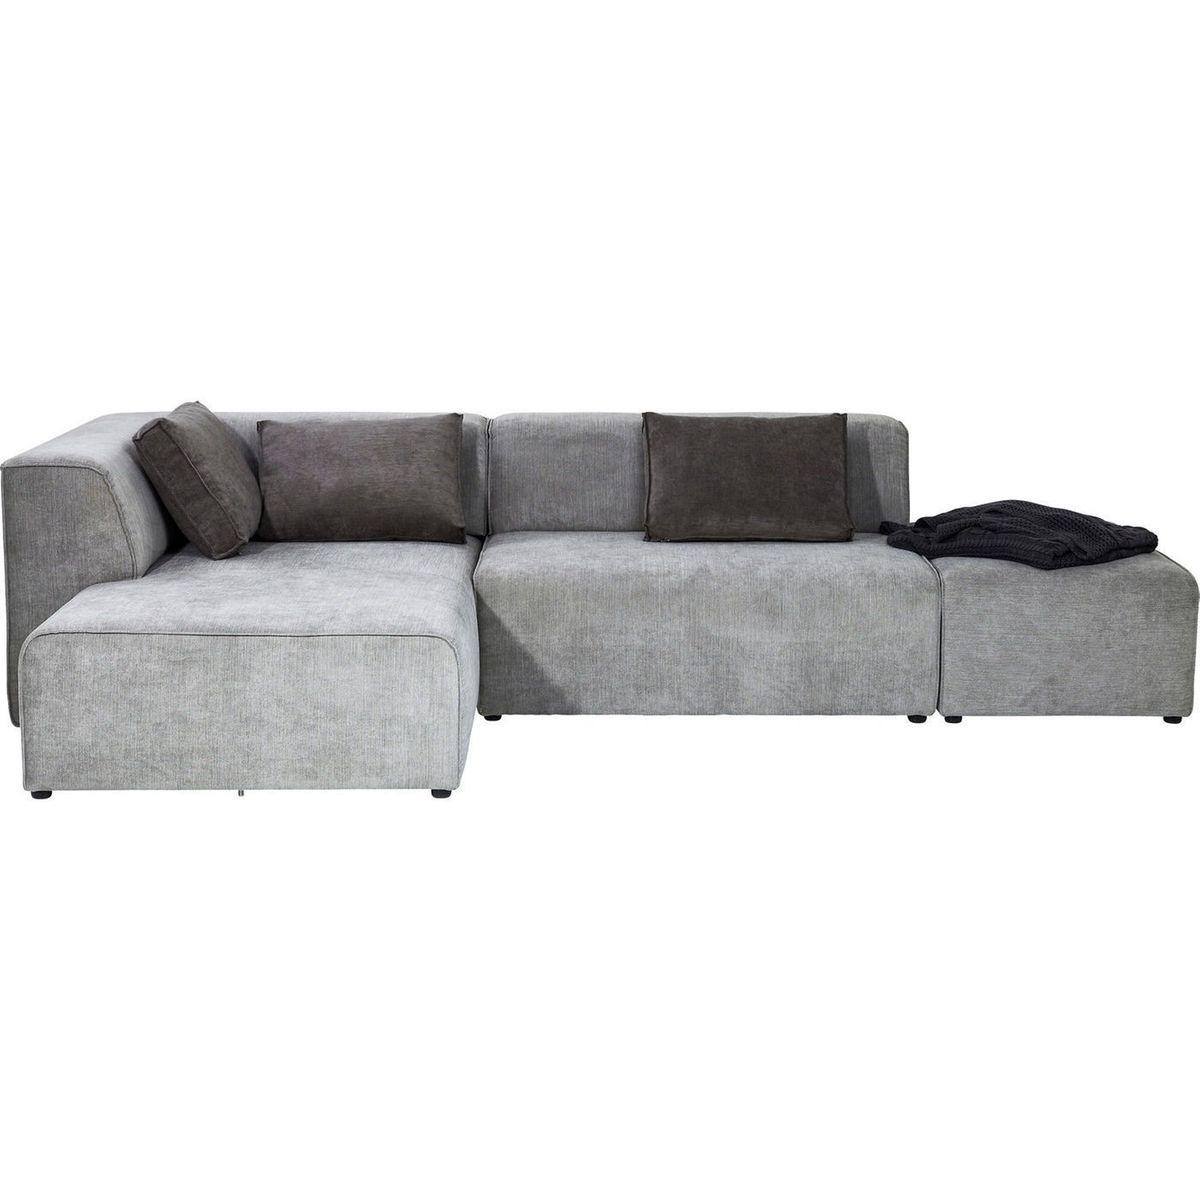 Canapé d'angle Infinity gauche Kare Design